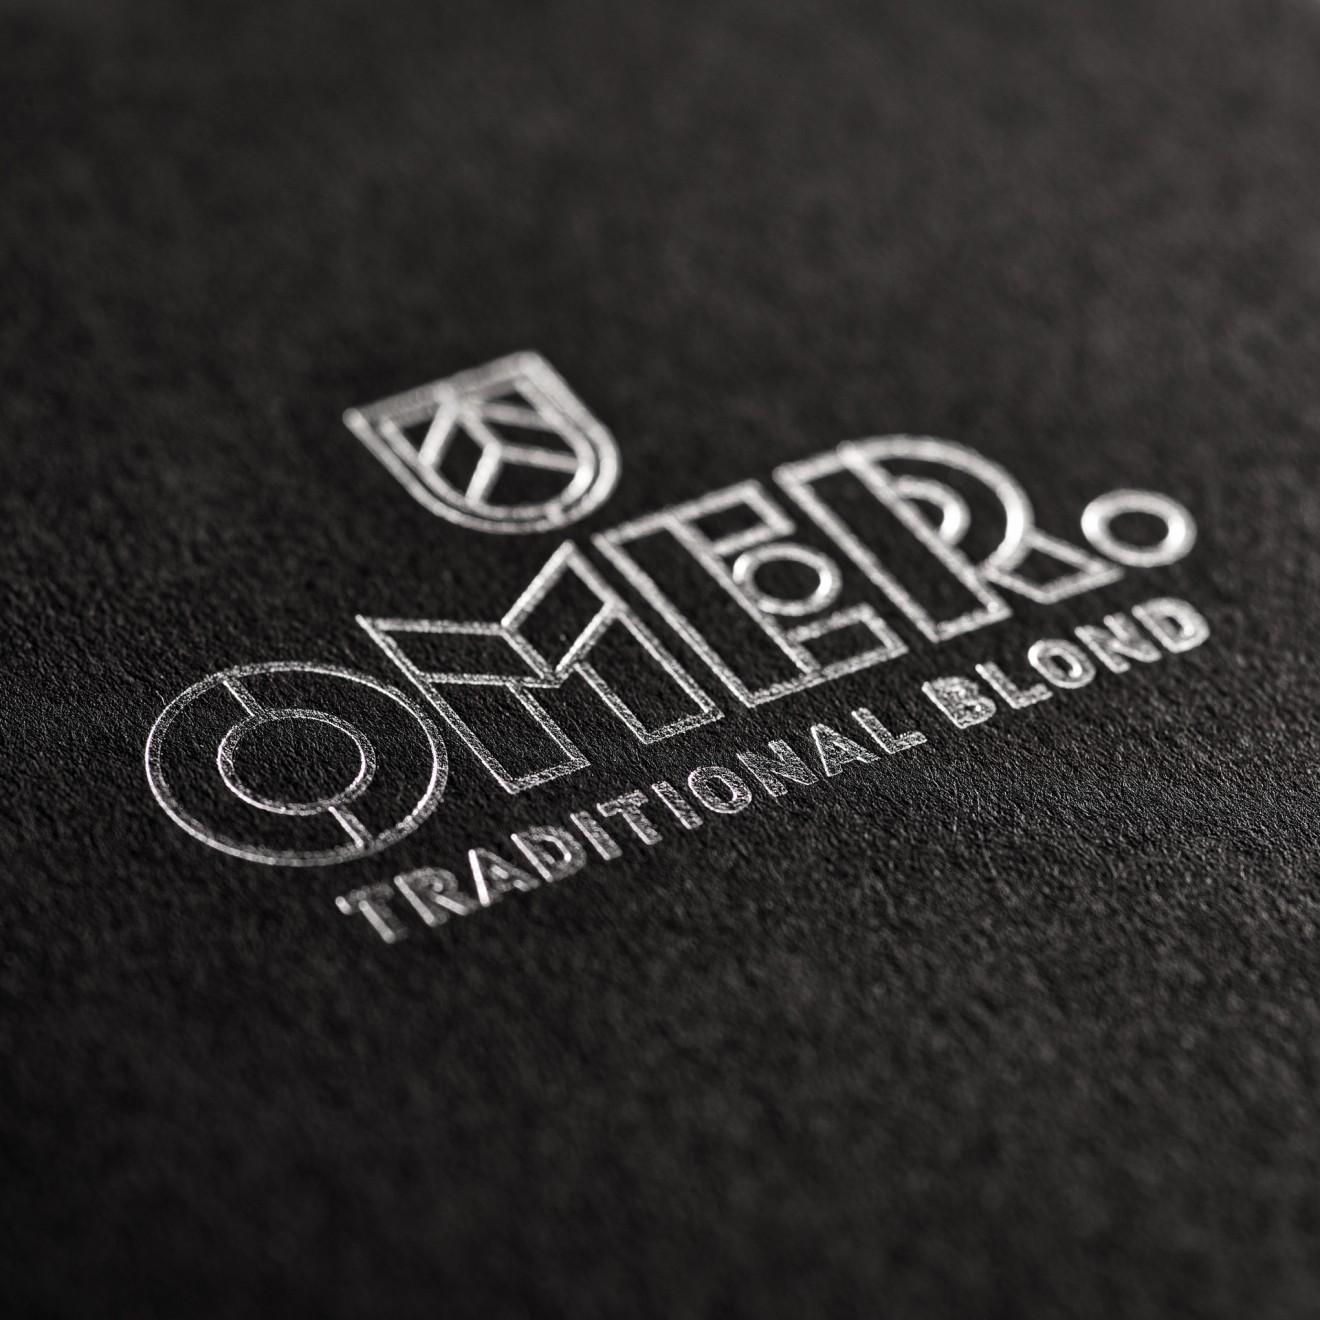 Quatre Mains package design - brand, foil printing, limited, edition